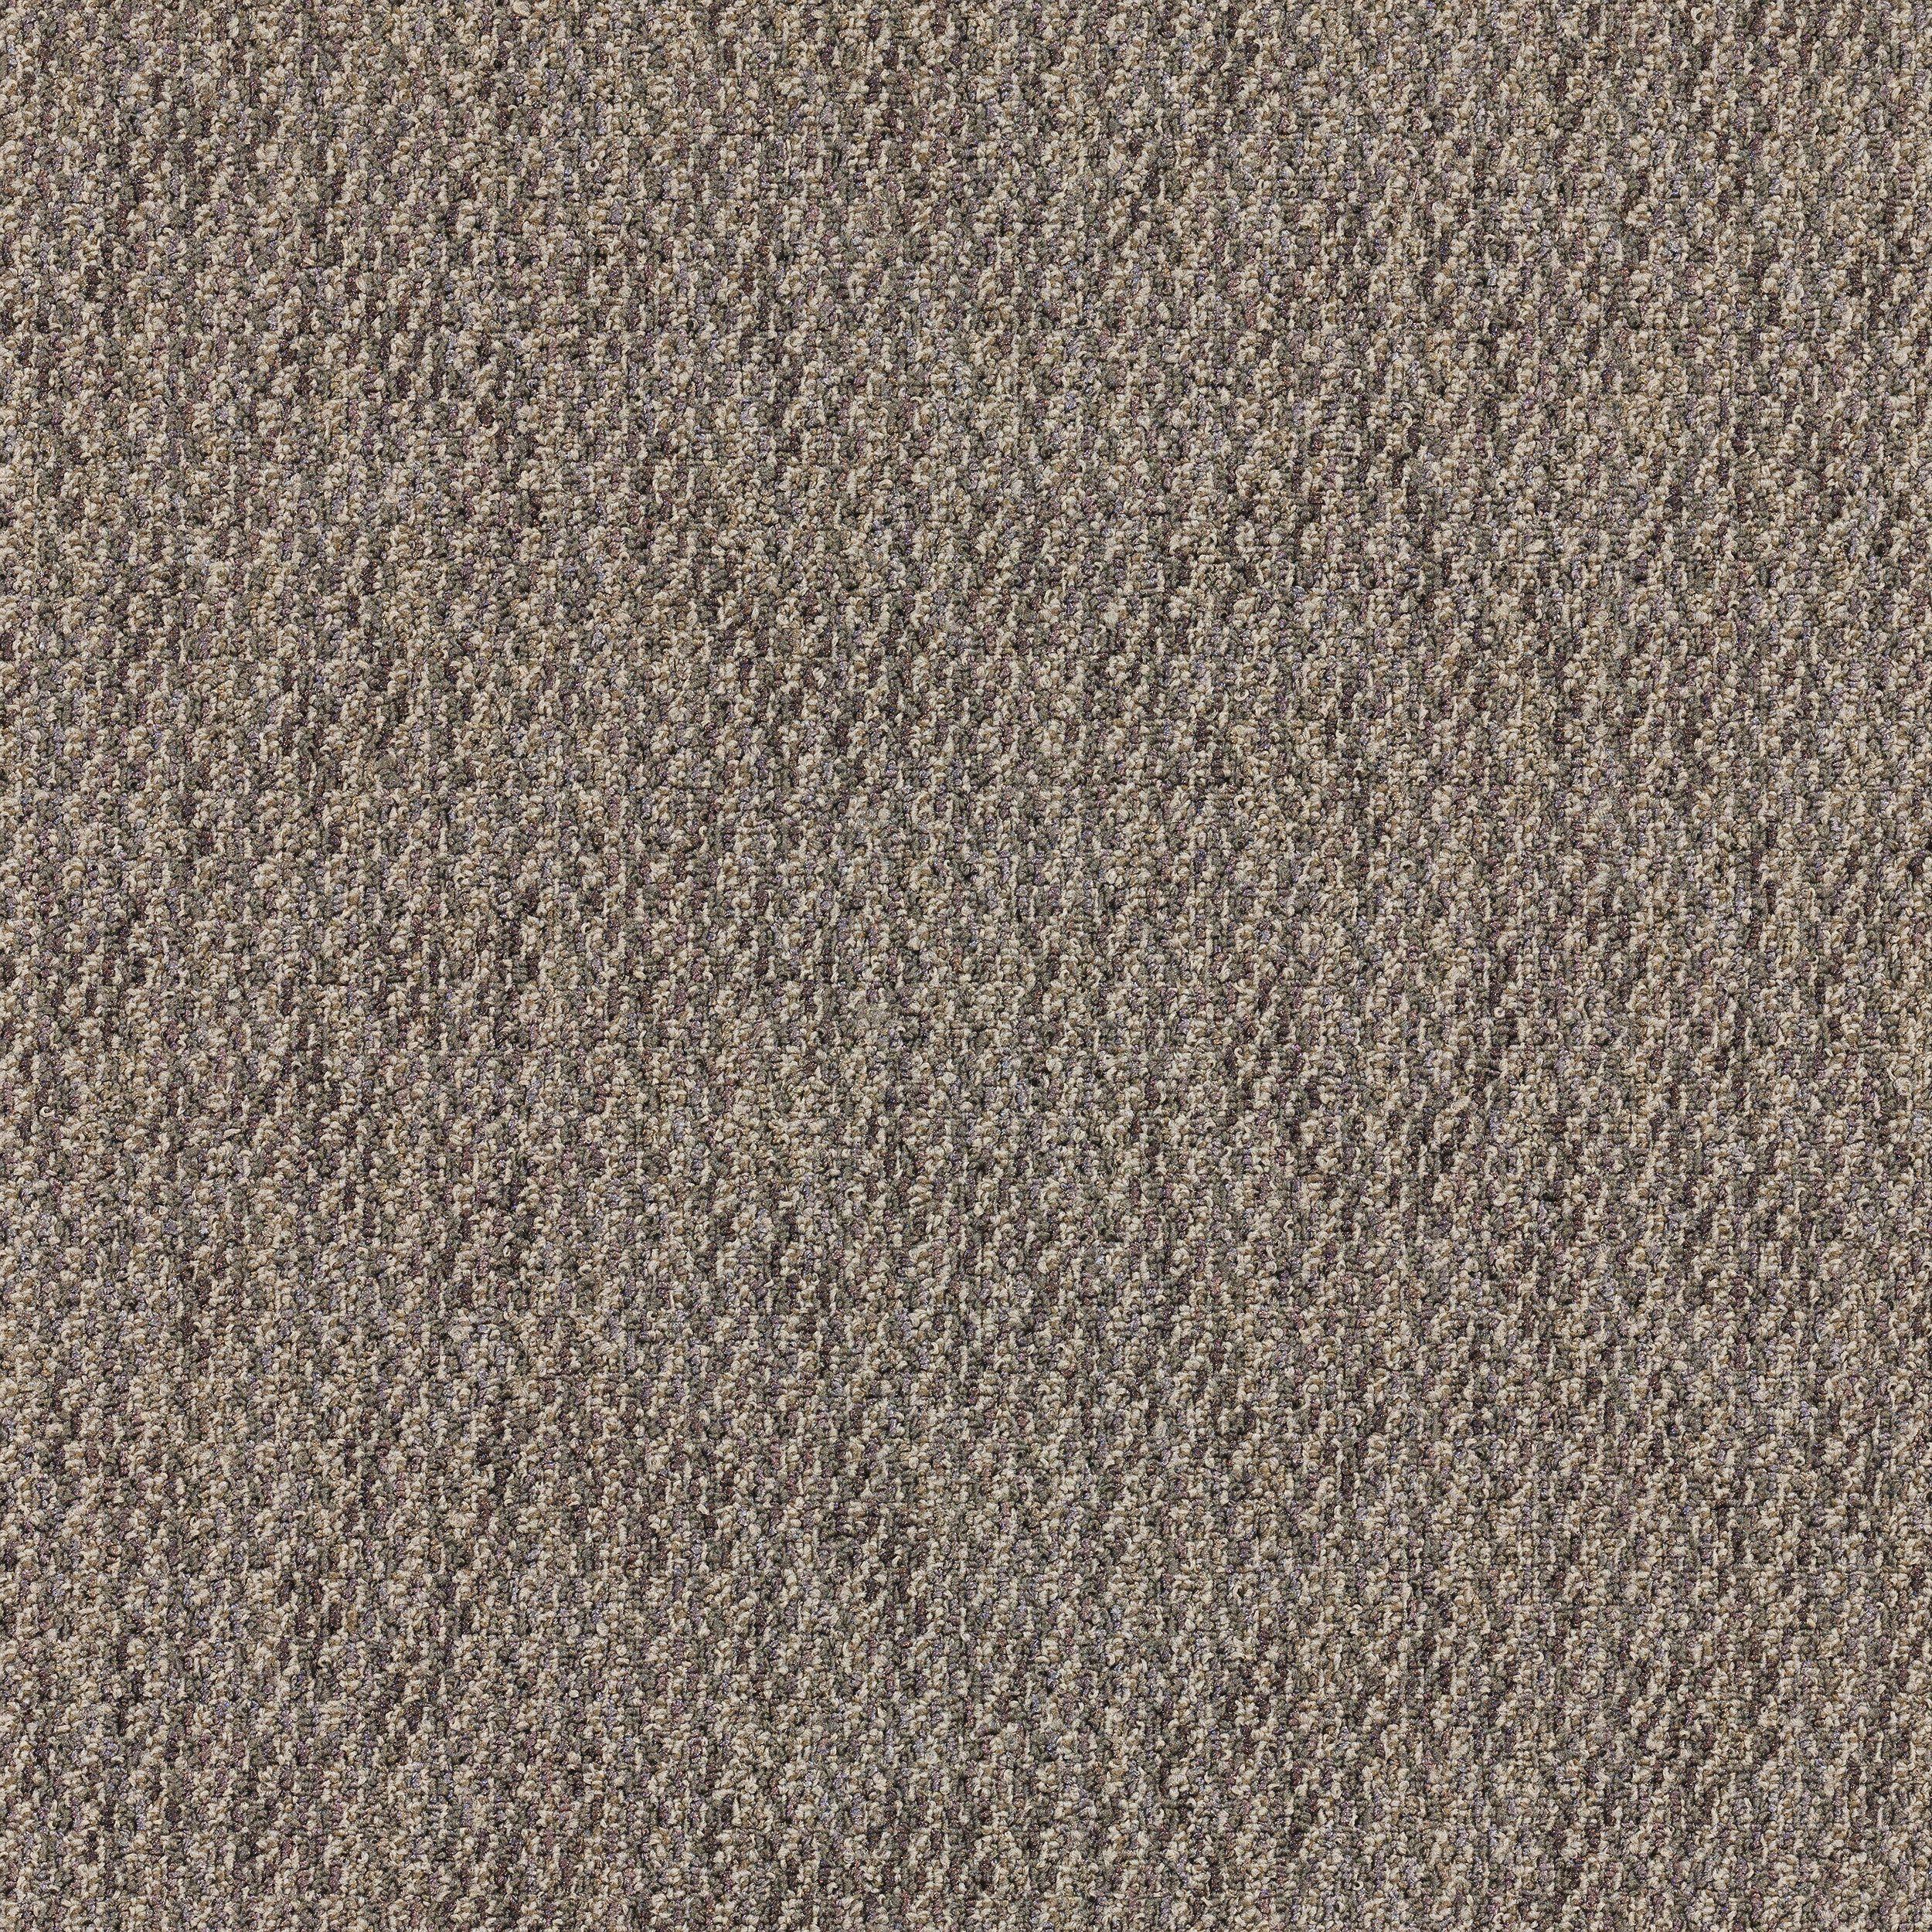 Mohawk carpet customer service for Mohawk flooring warranty